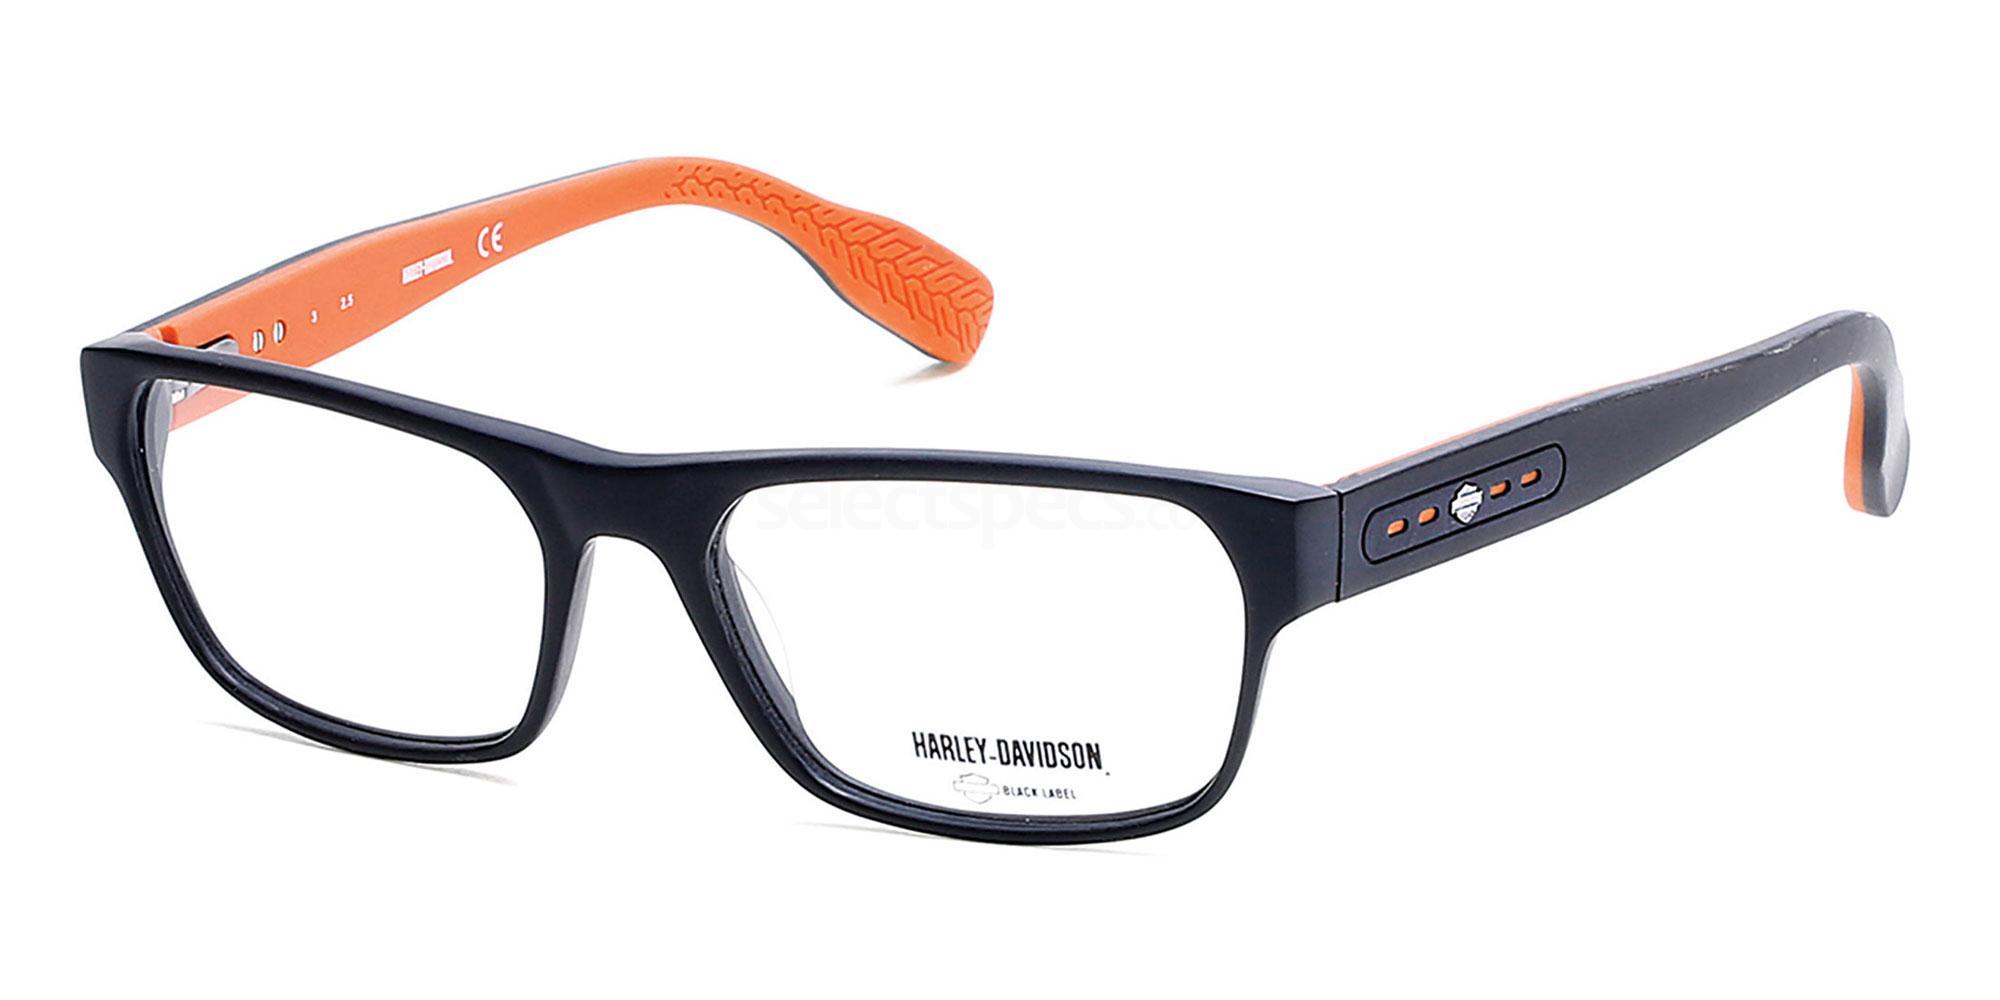 002 HD 1037 Glasses, Harley Davidson